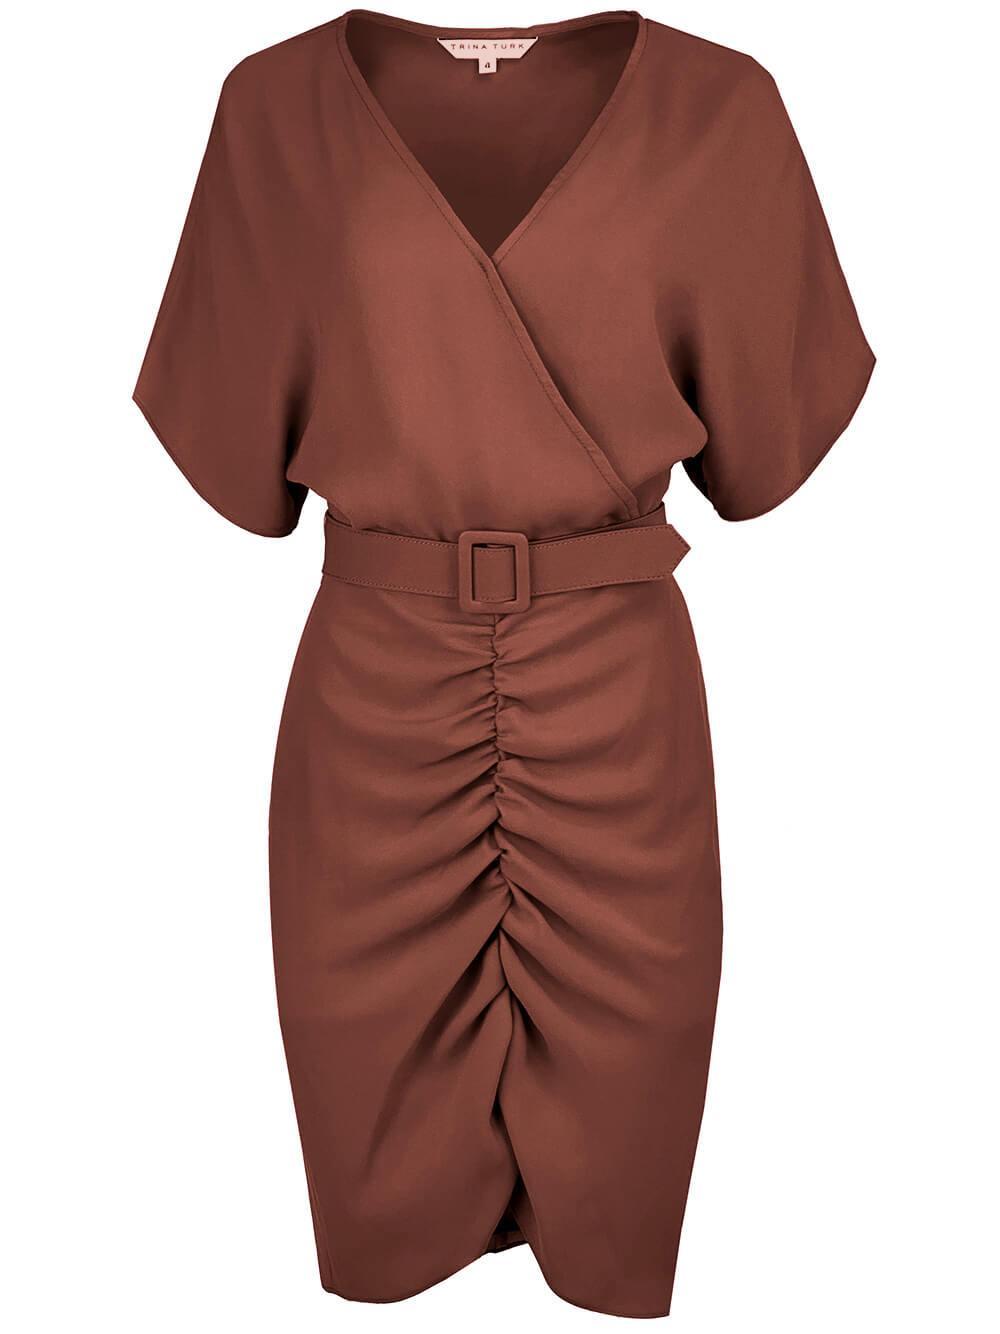 Zest Dress Item # 2108318SB1